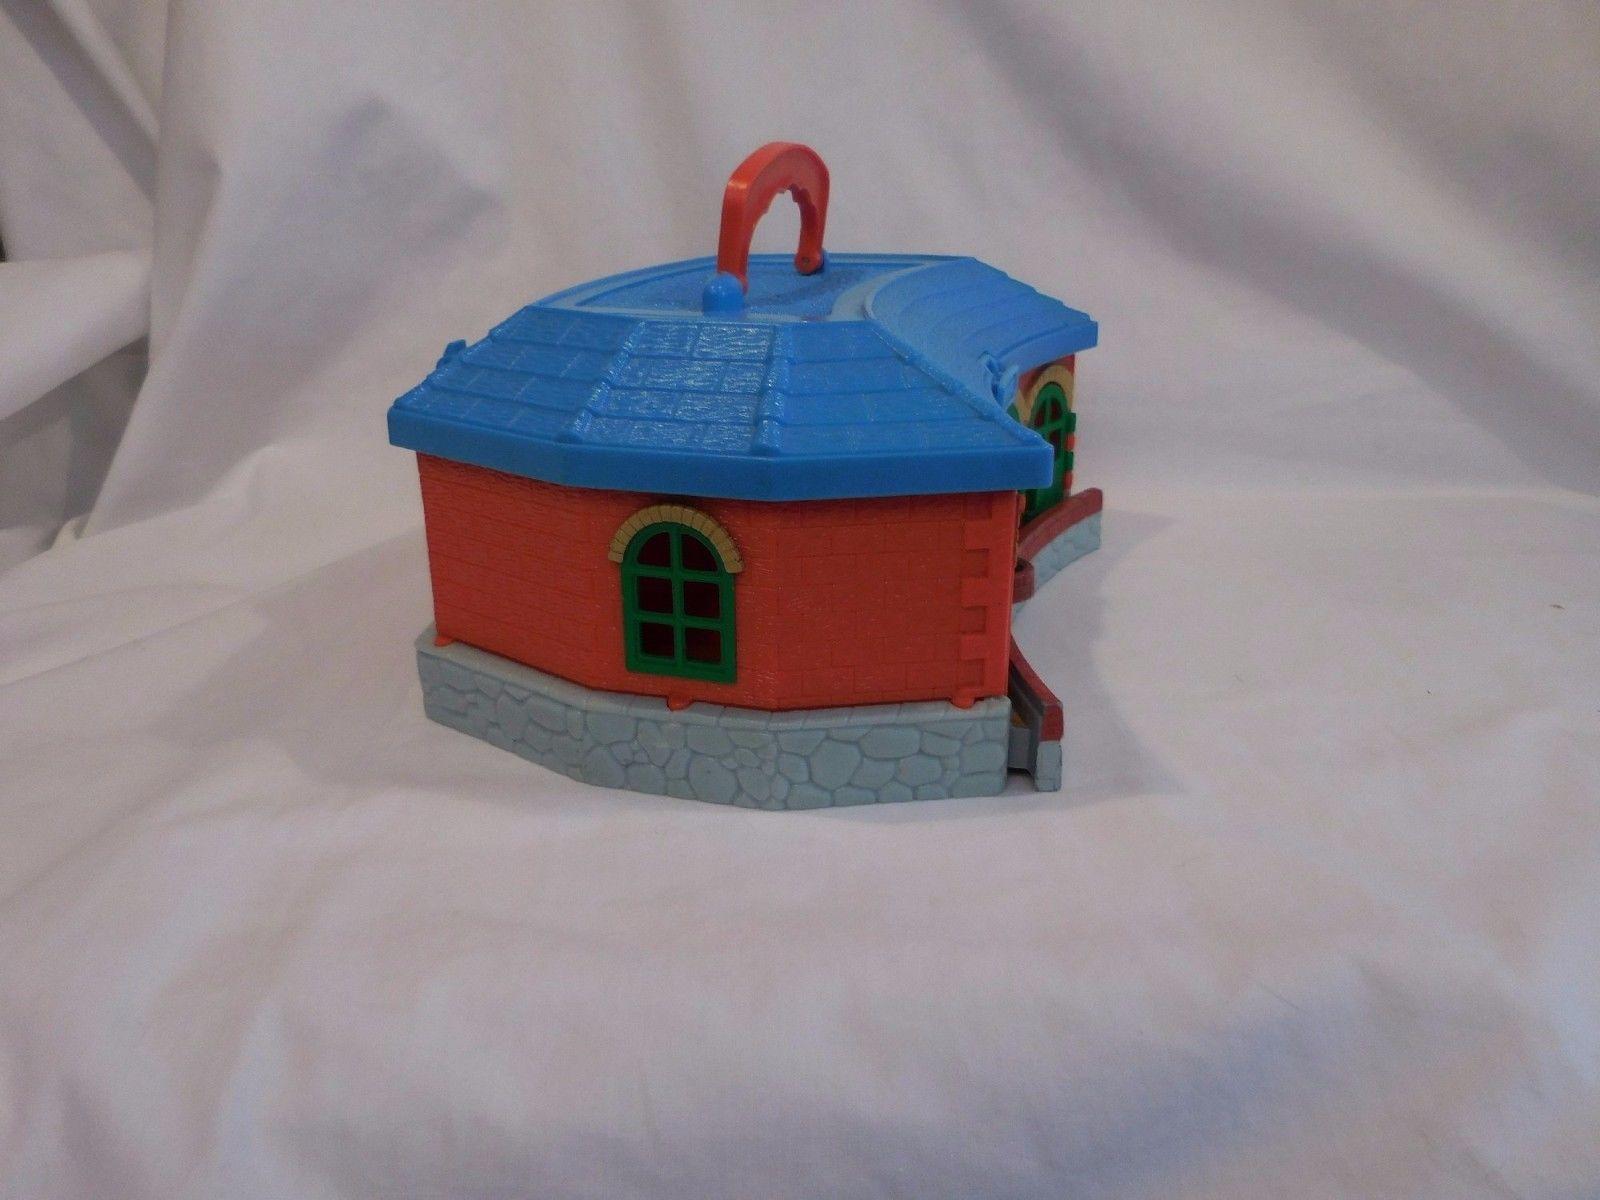 2002 Thomas the Train Take & Play Carry Storage Case Roundhouse